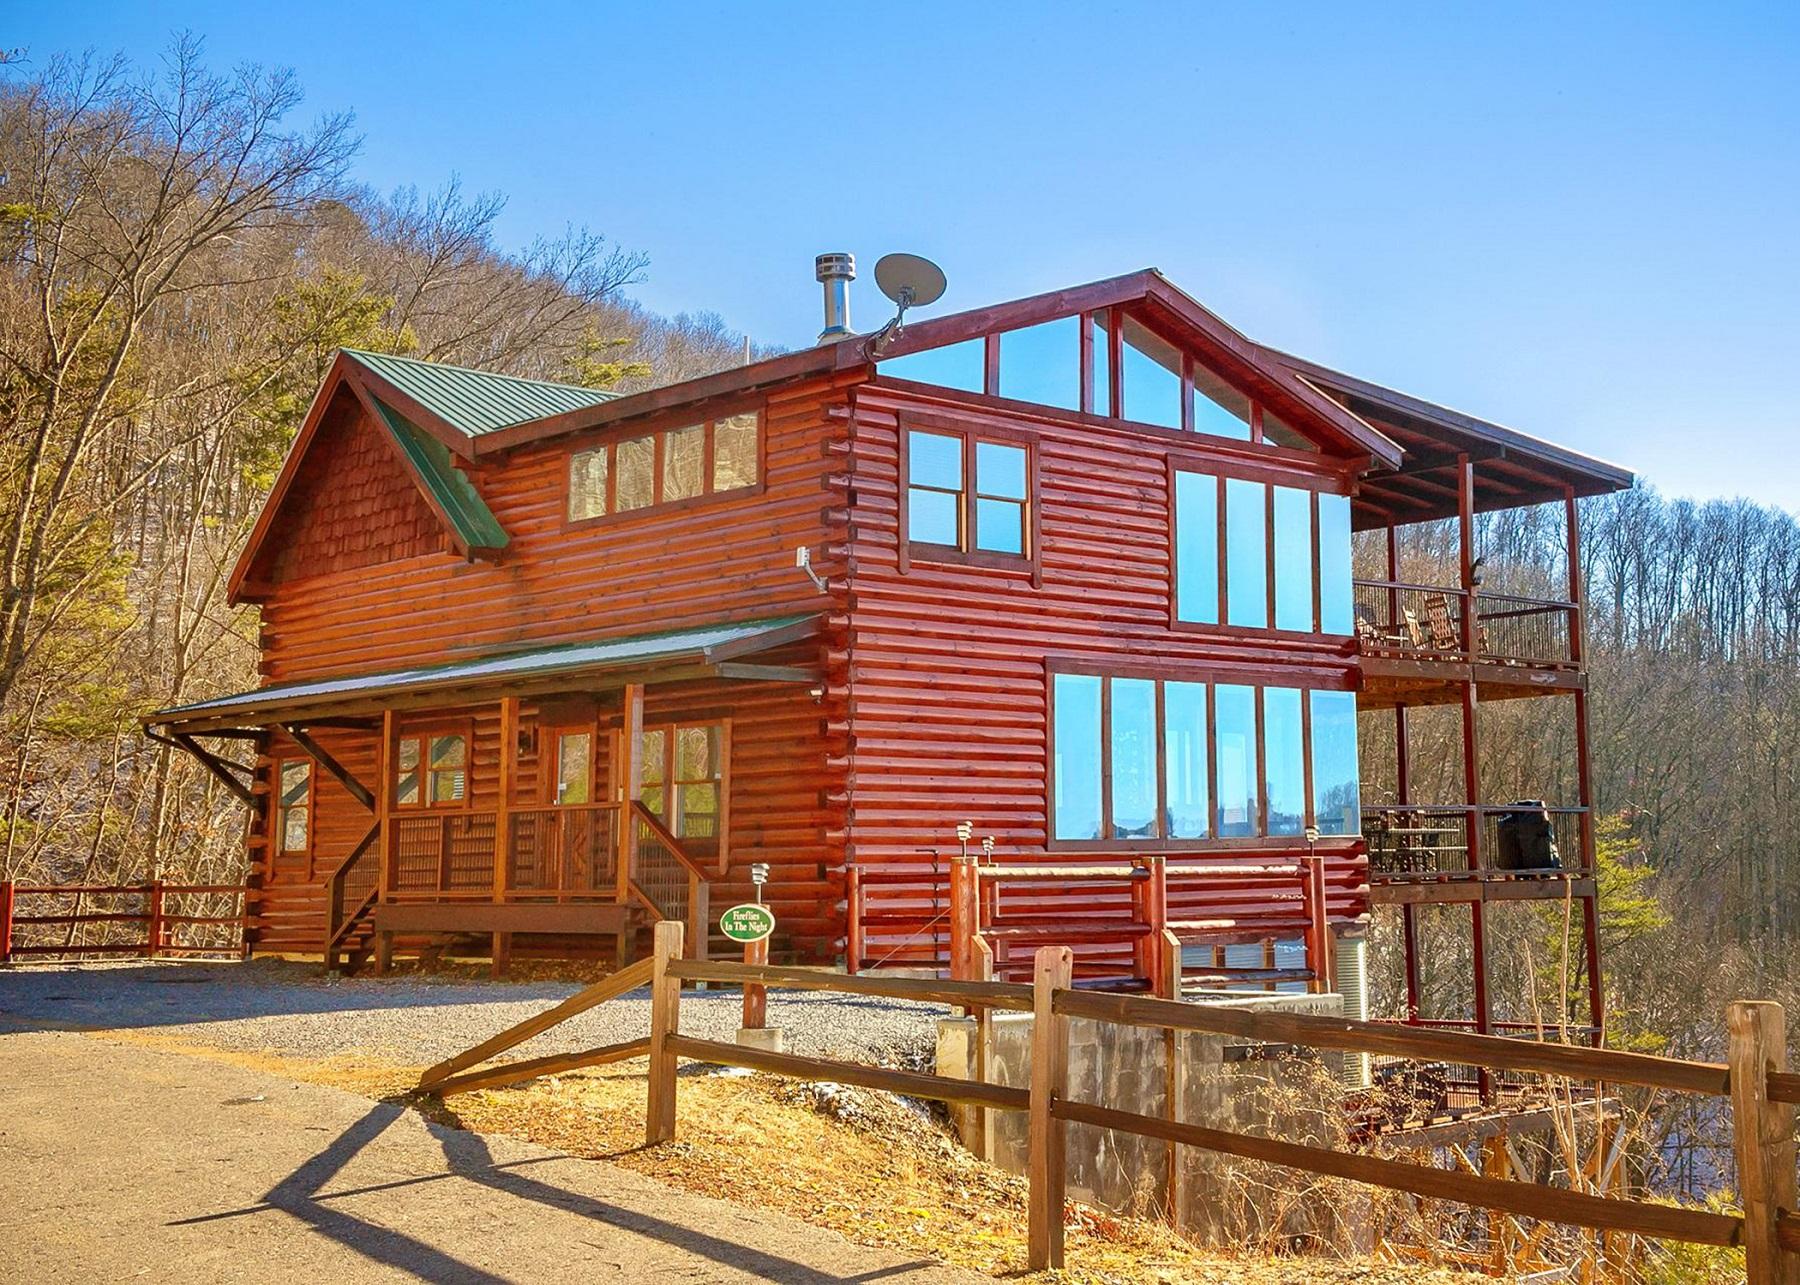 seven-bedroom, eight-and-a-half-bath cabin